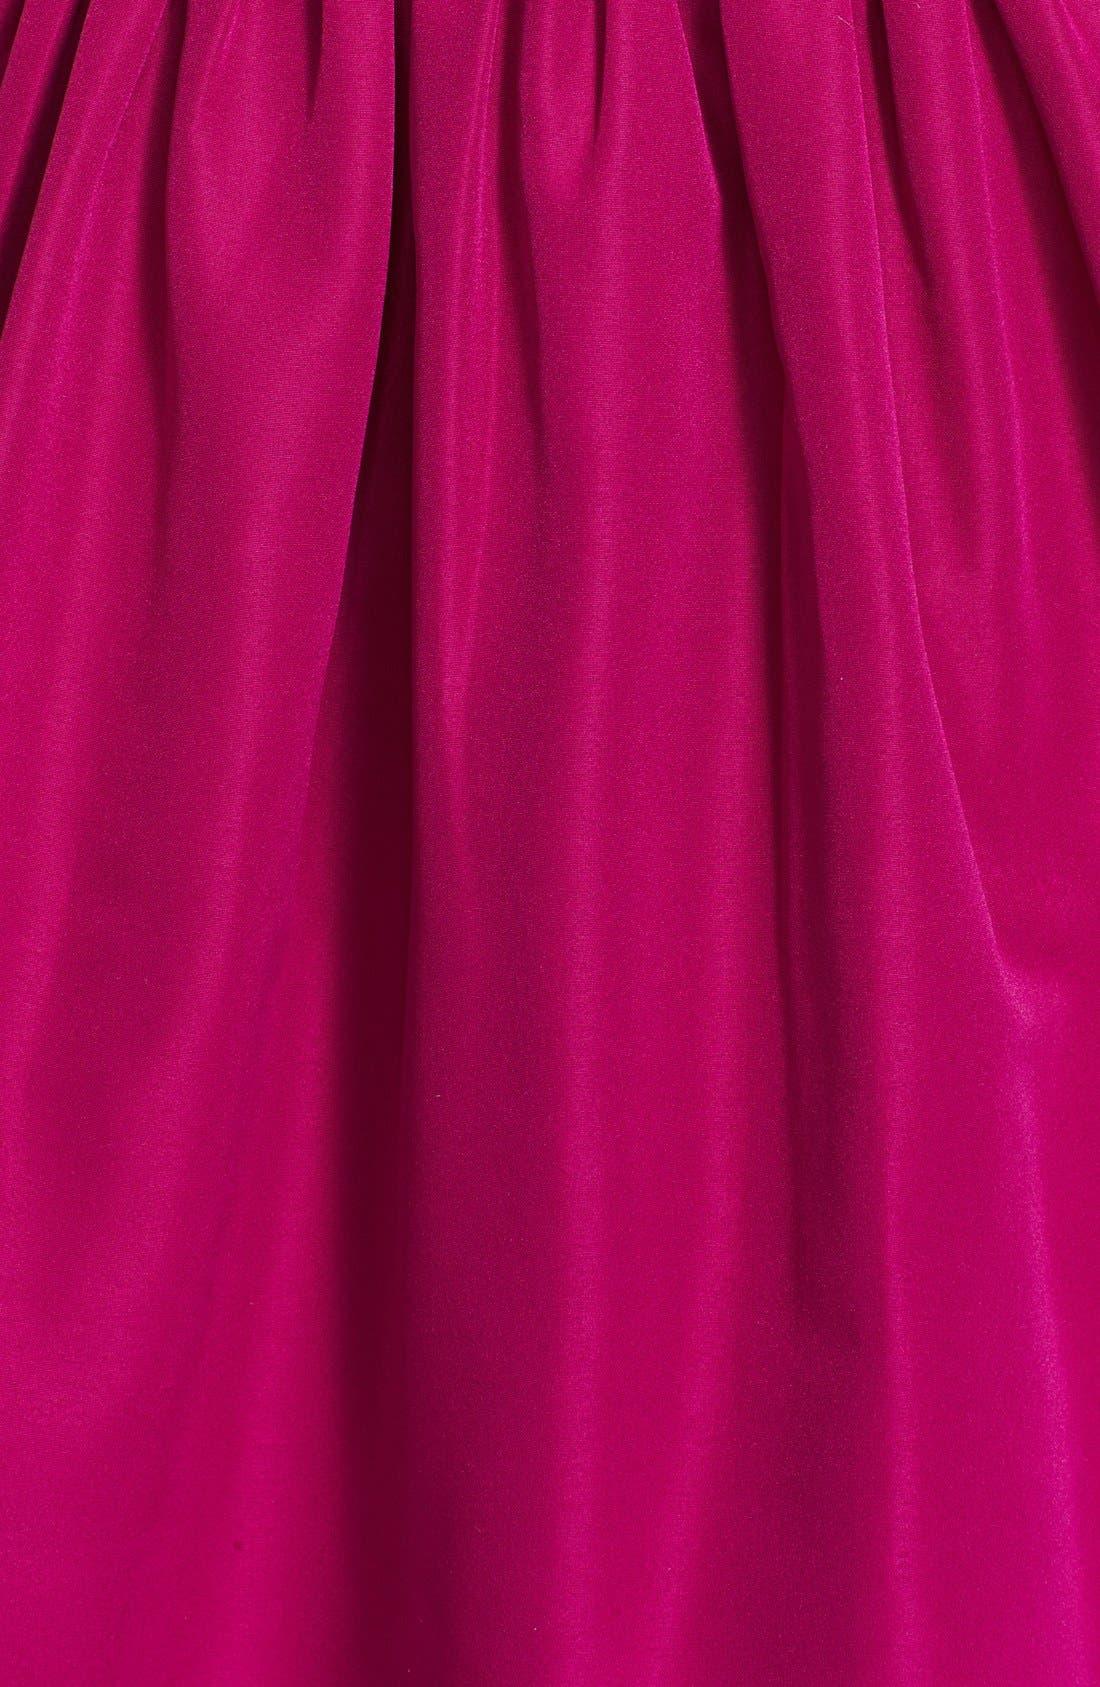 Alternate Image 3  - Ted Baker London 'Juletee' Stretch Woven Fit & Flare Dress